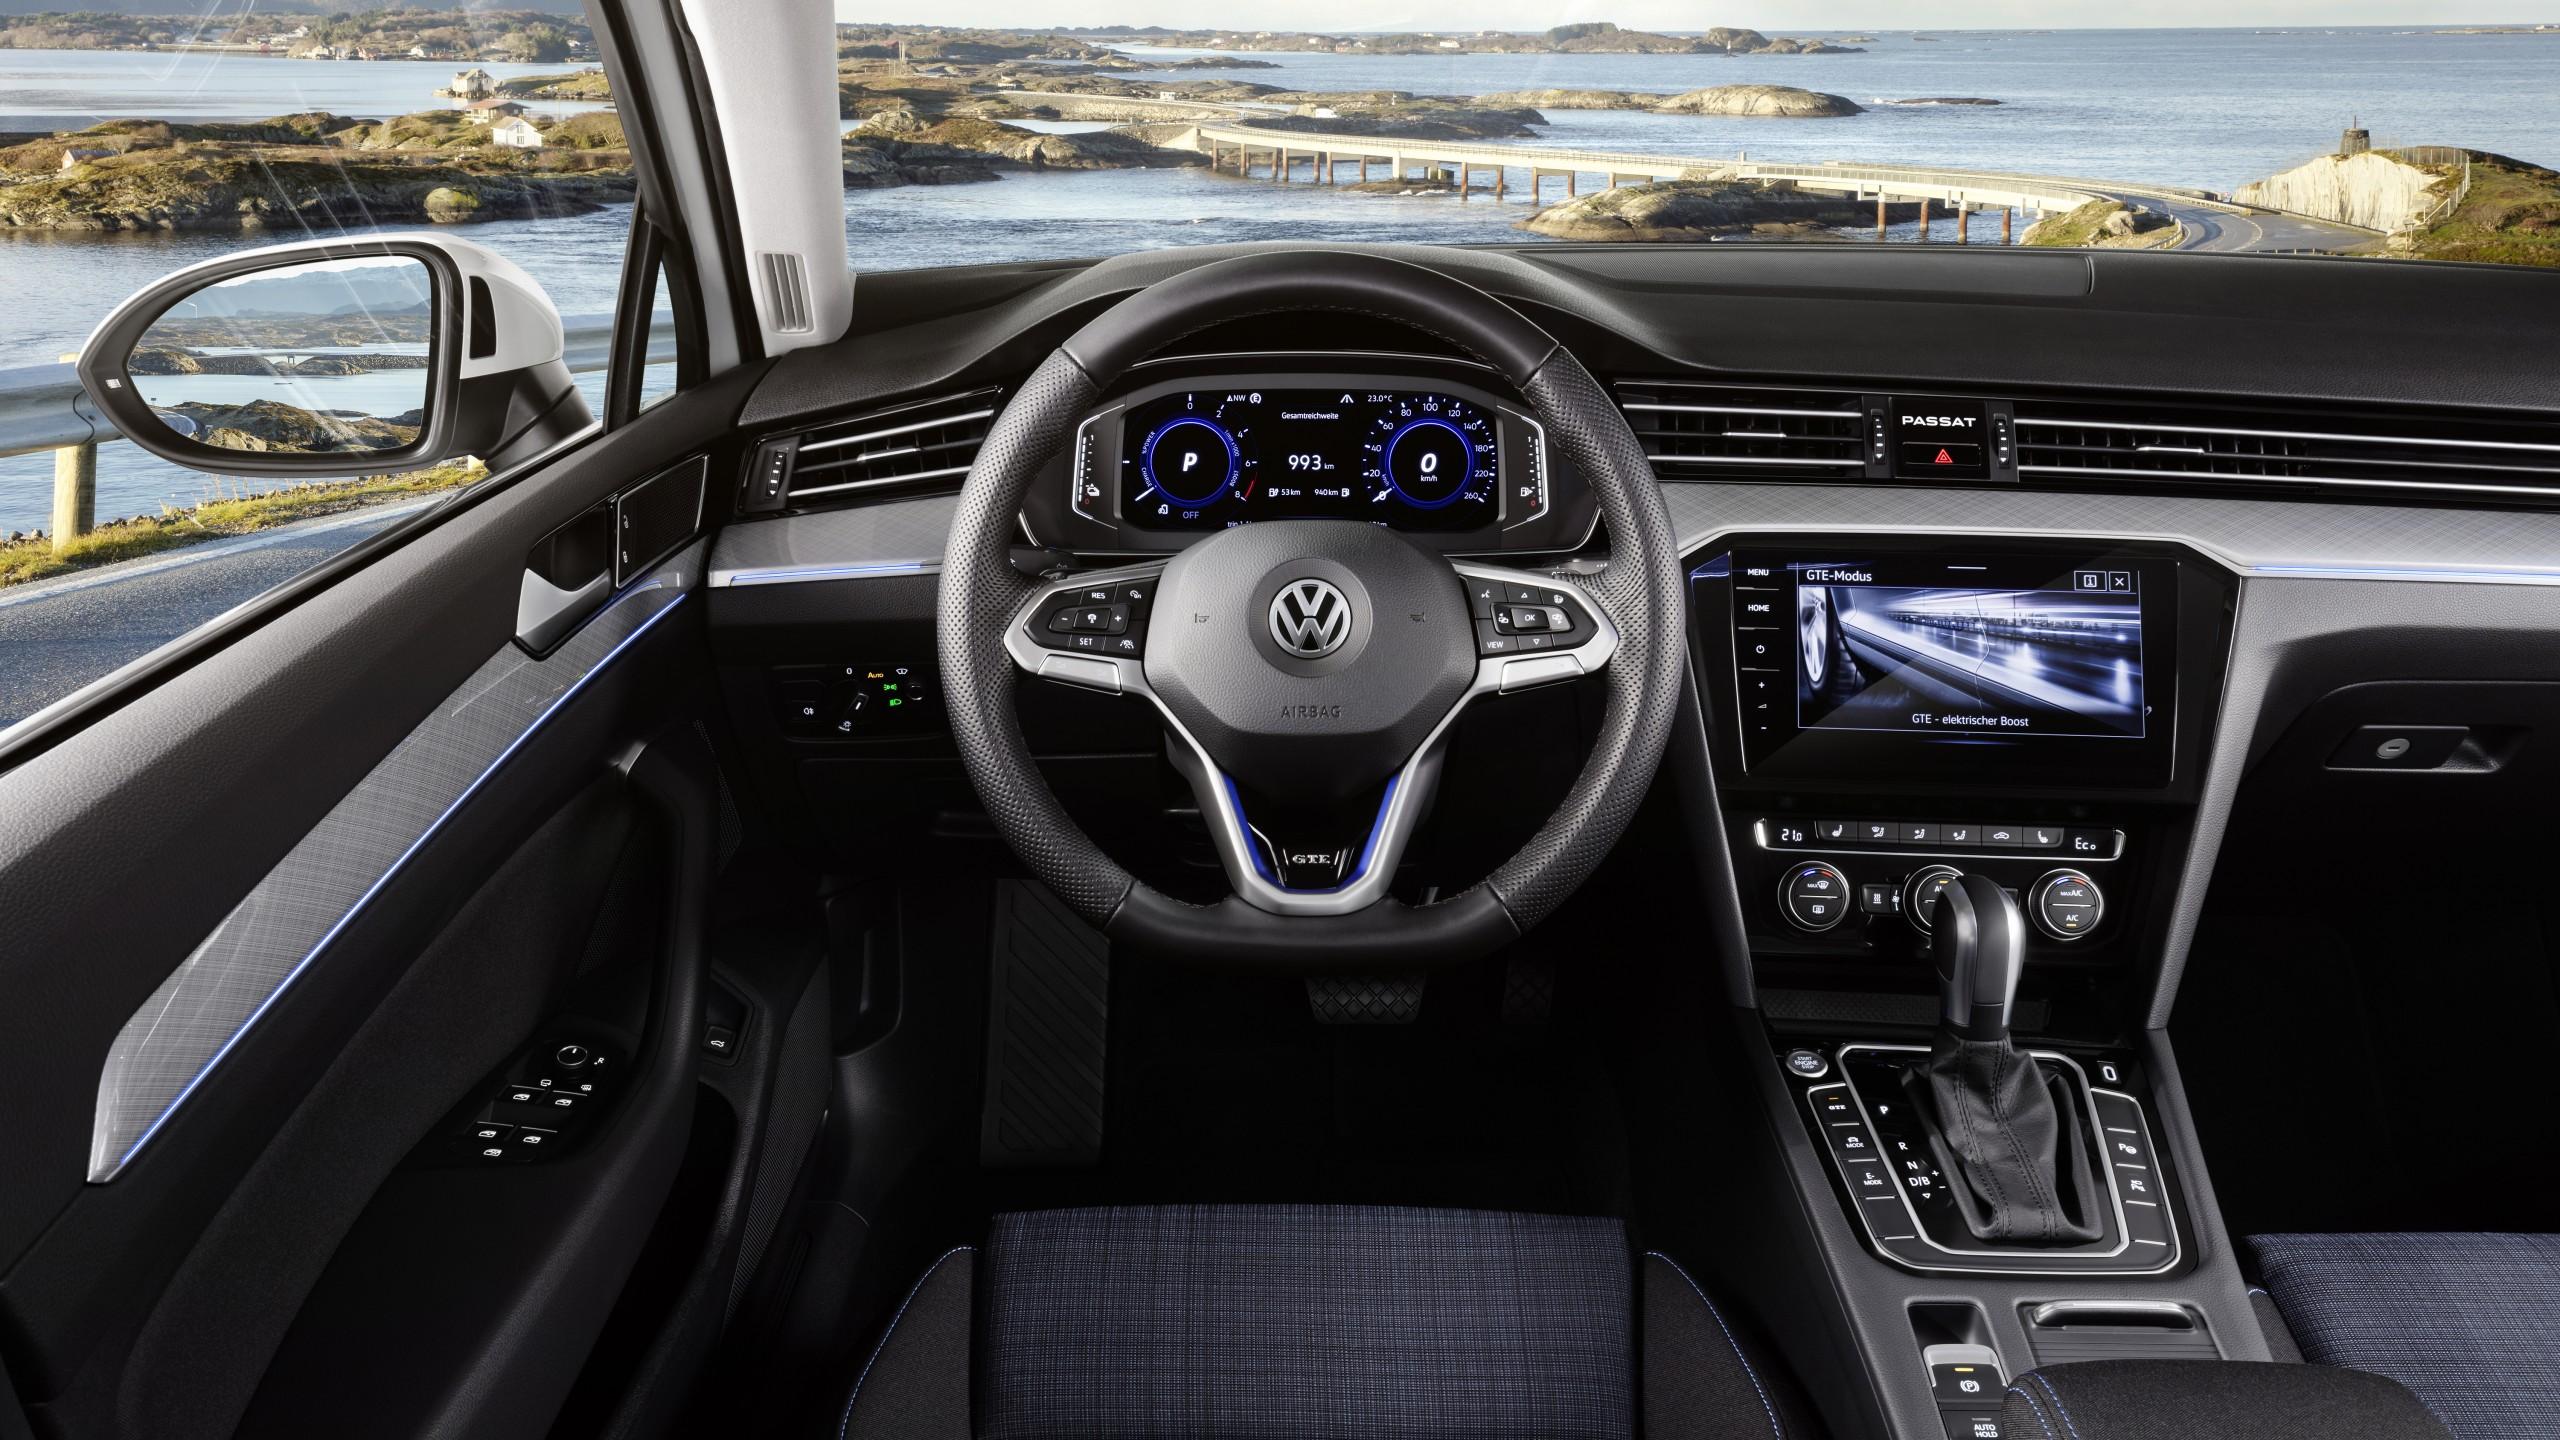 Wallpaper Volkswagen Passat Gte 2020 Cars 5k Cars